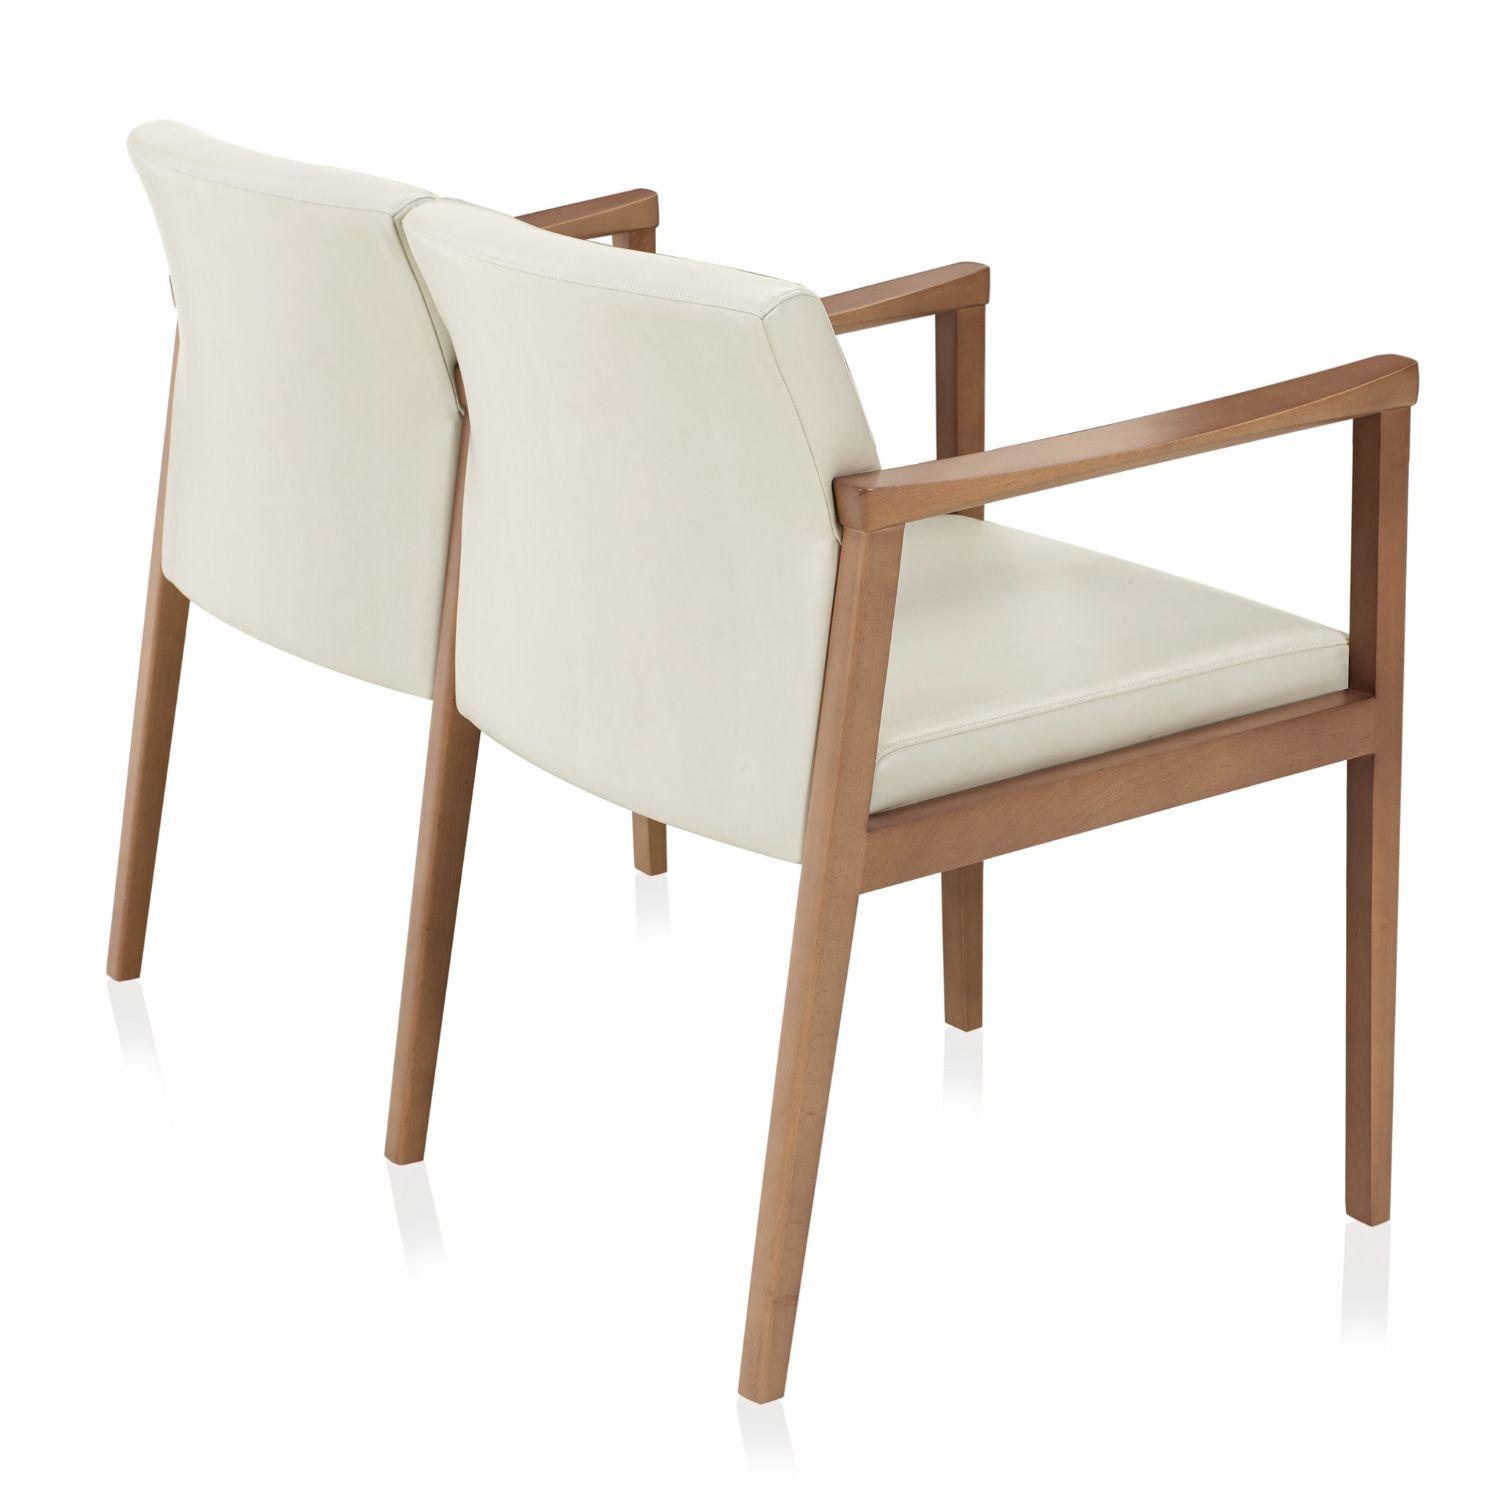 ki affina wood and leather seating